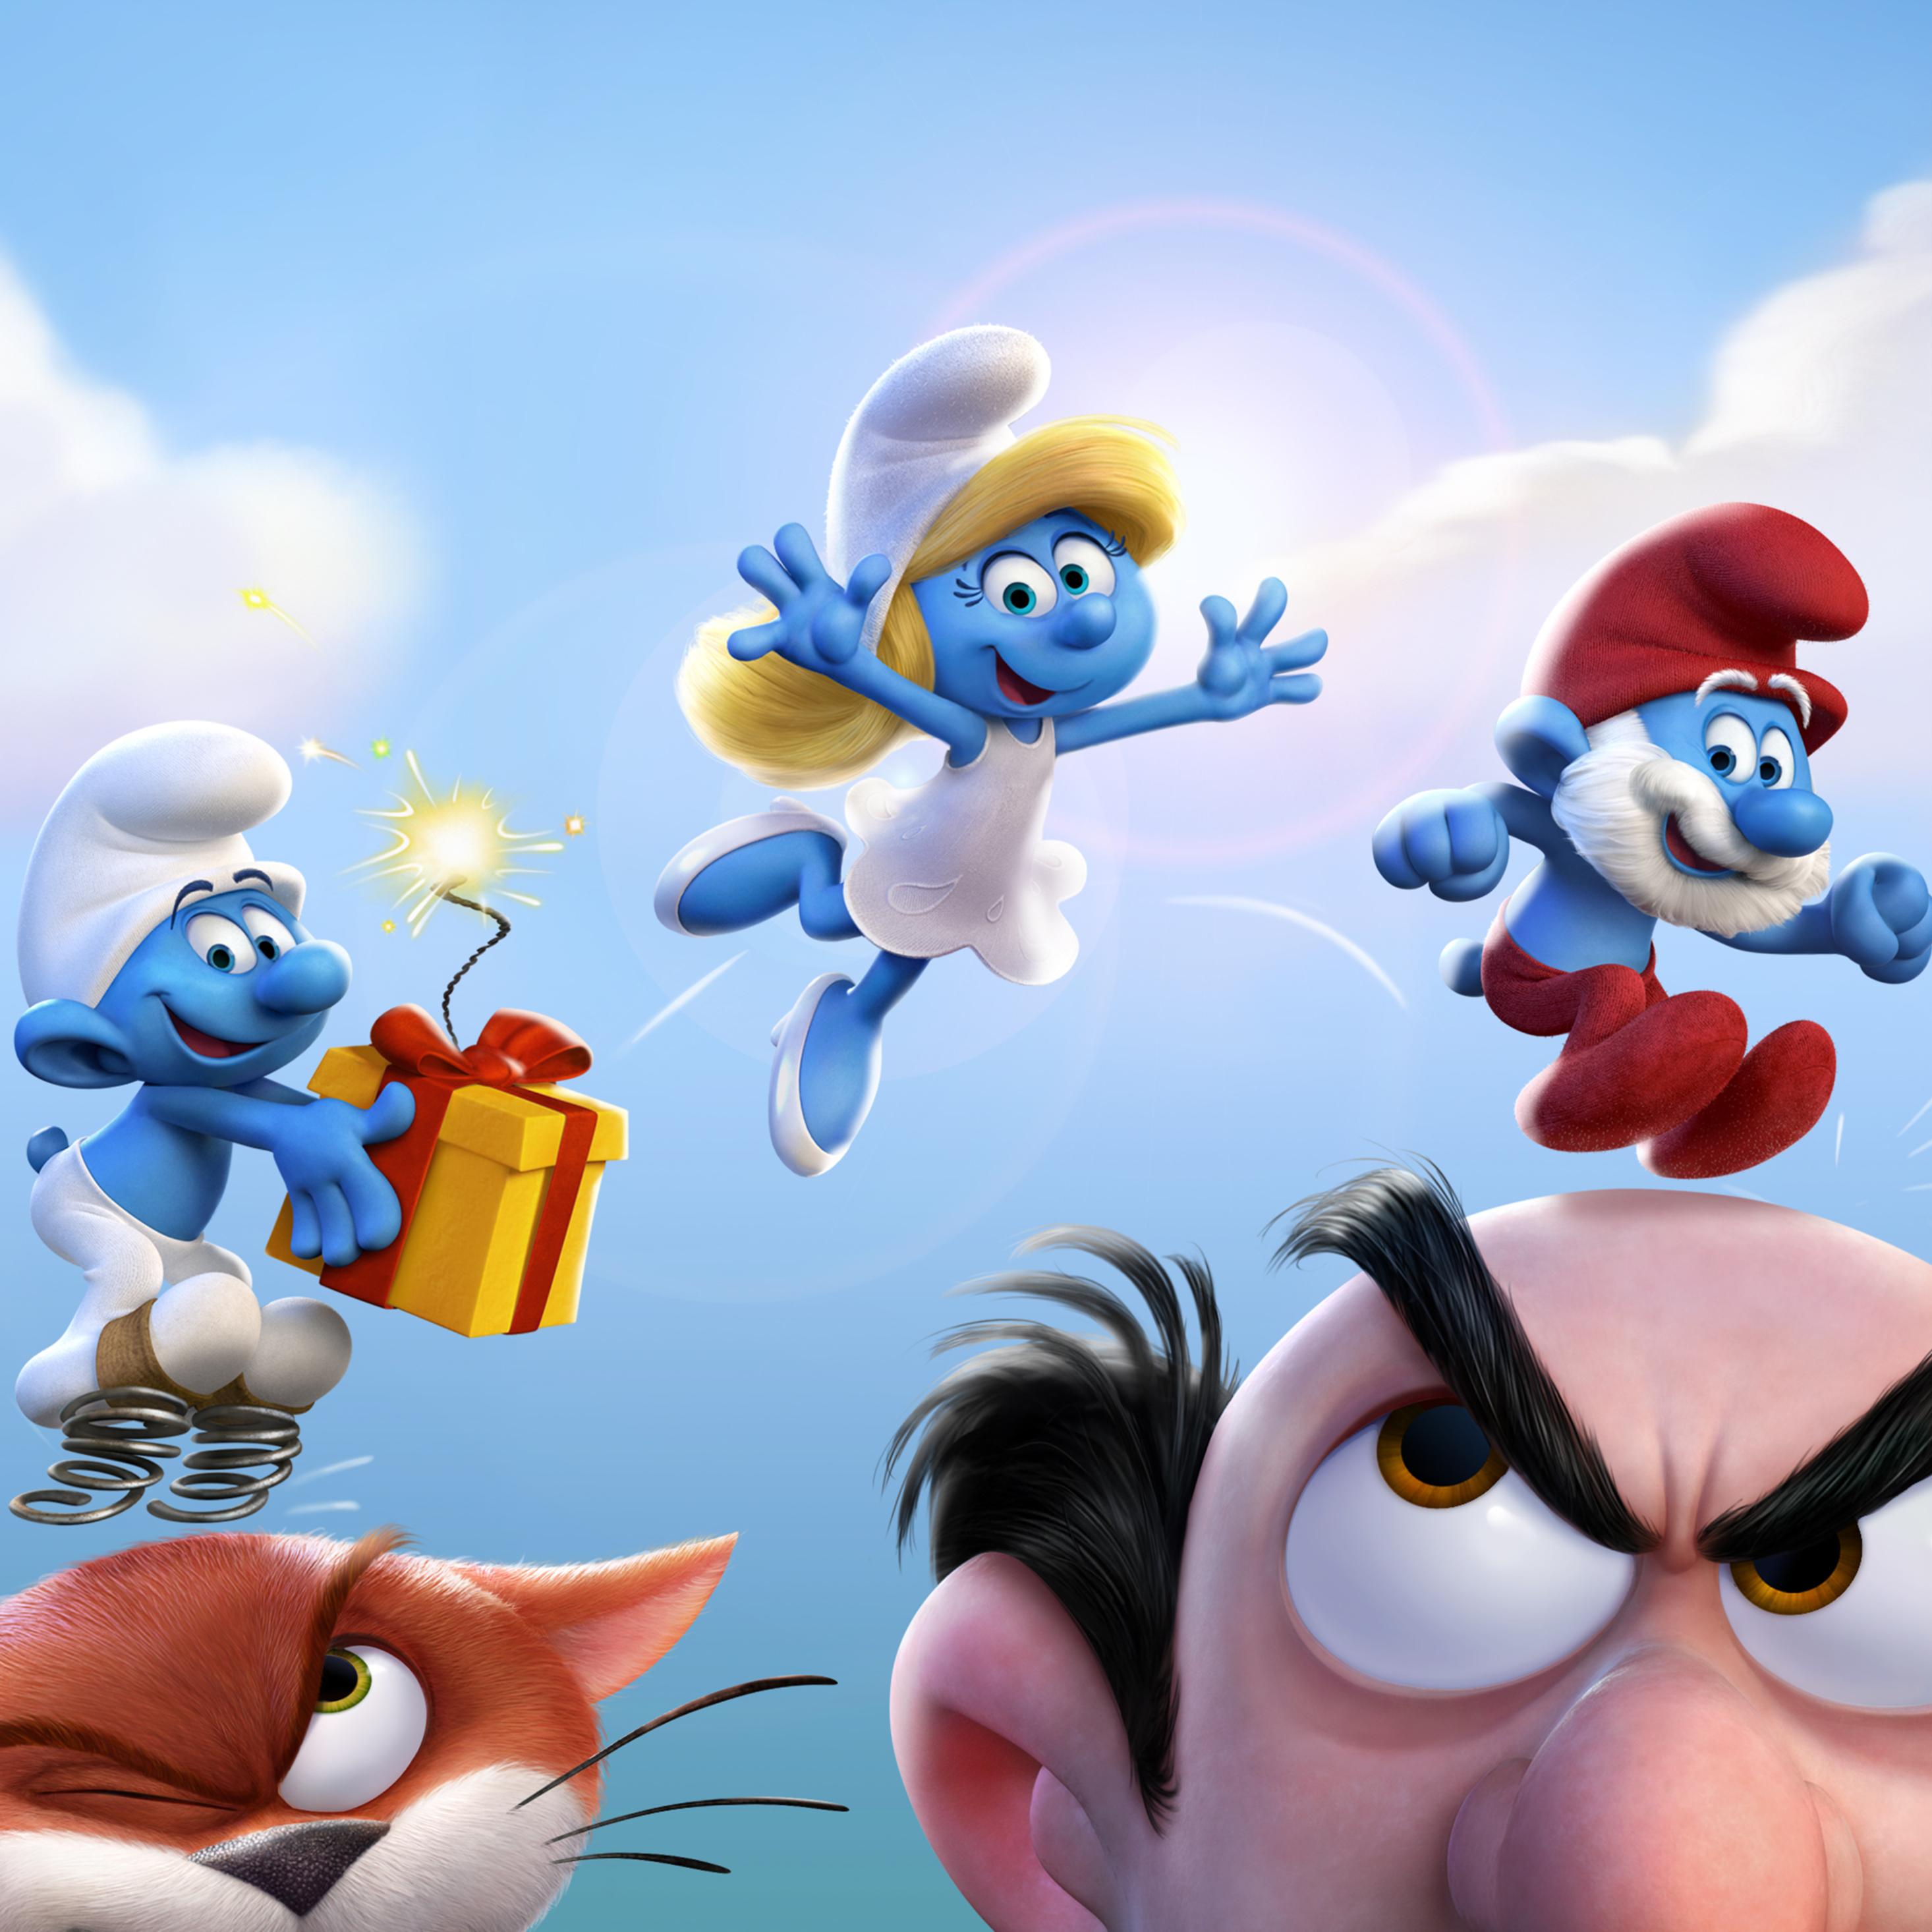 2932x2932 Smurfs The Lost Village Official Ipad Pro Retina ...